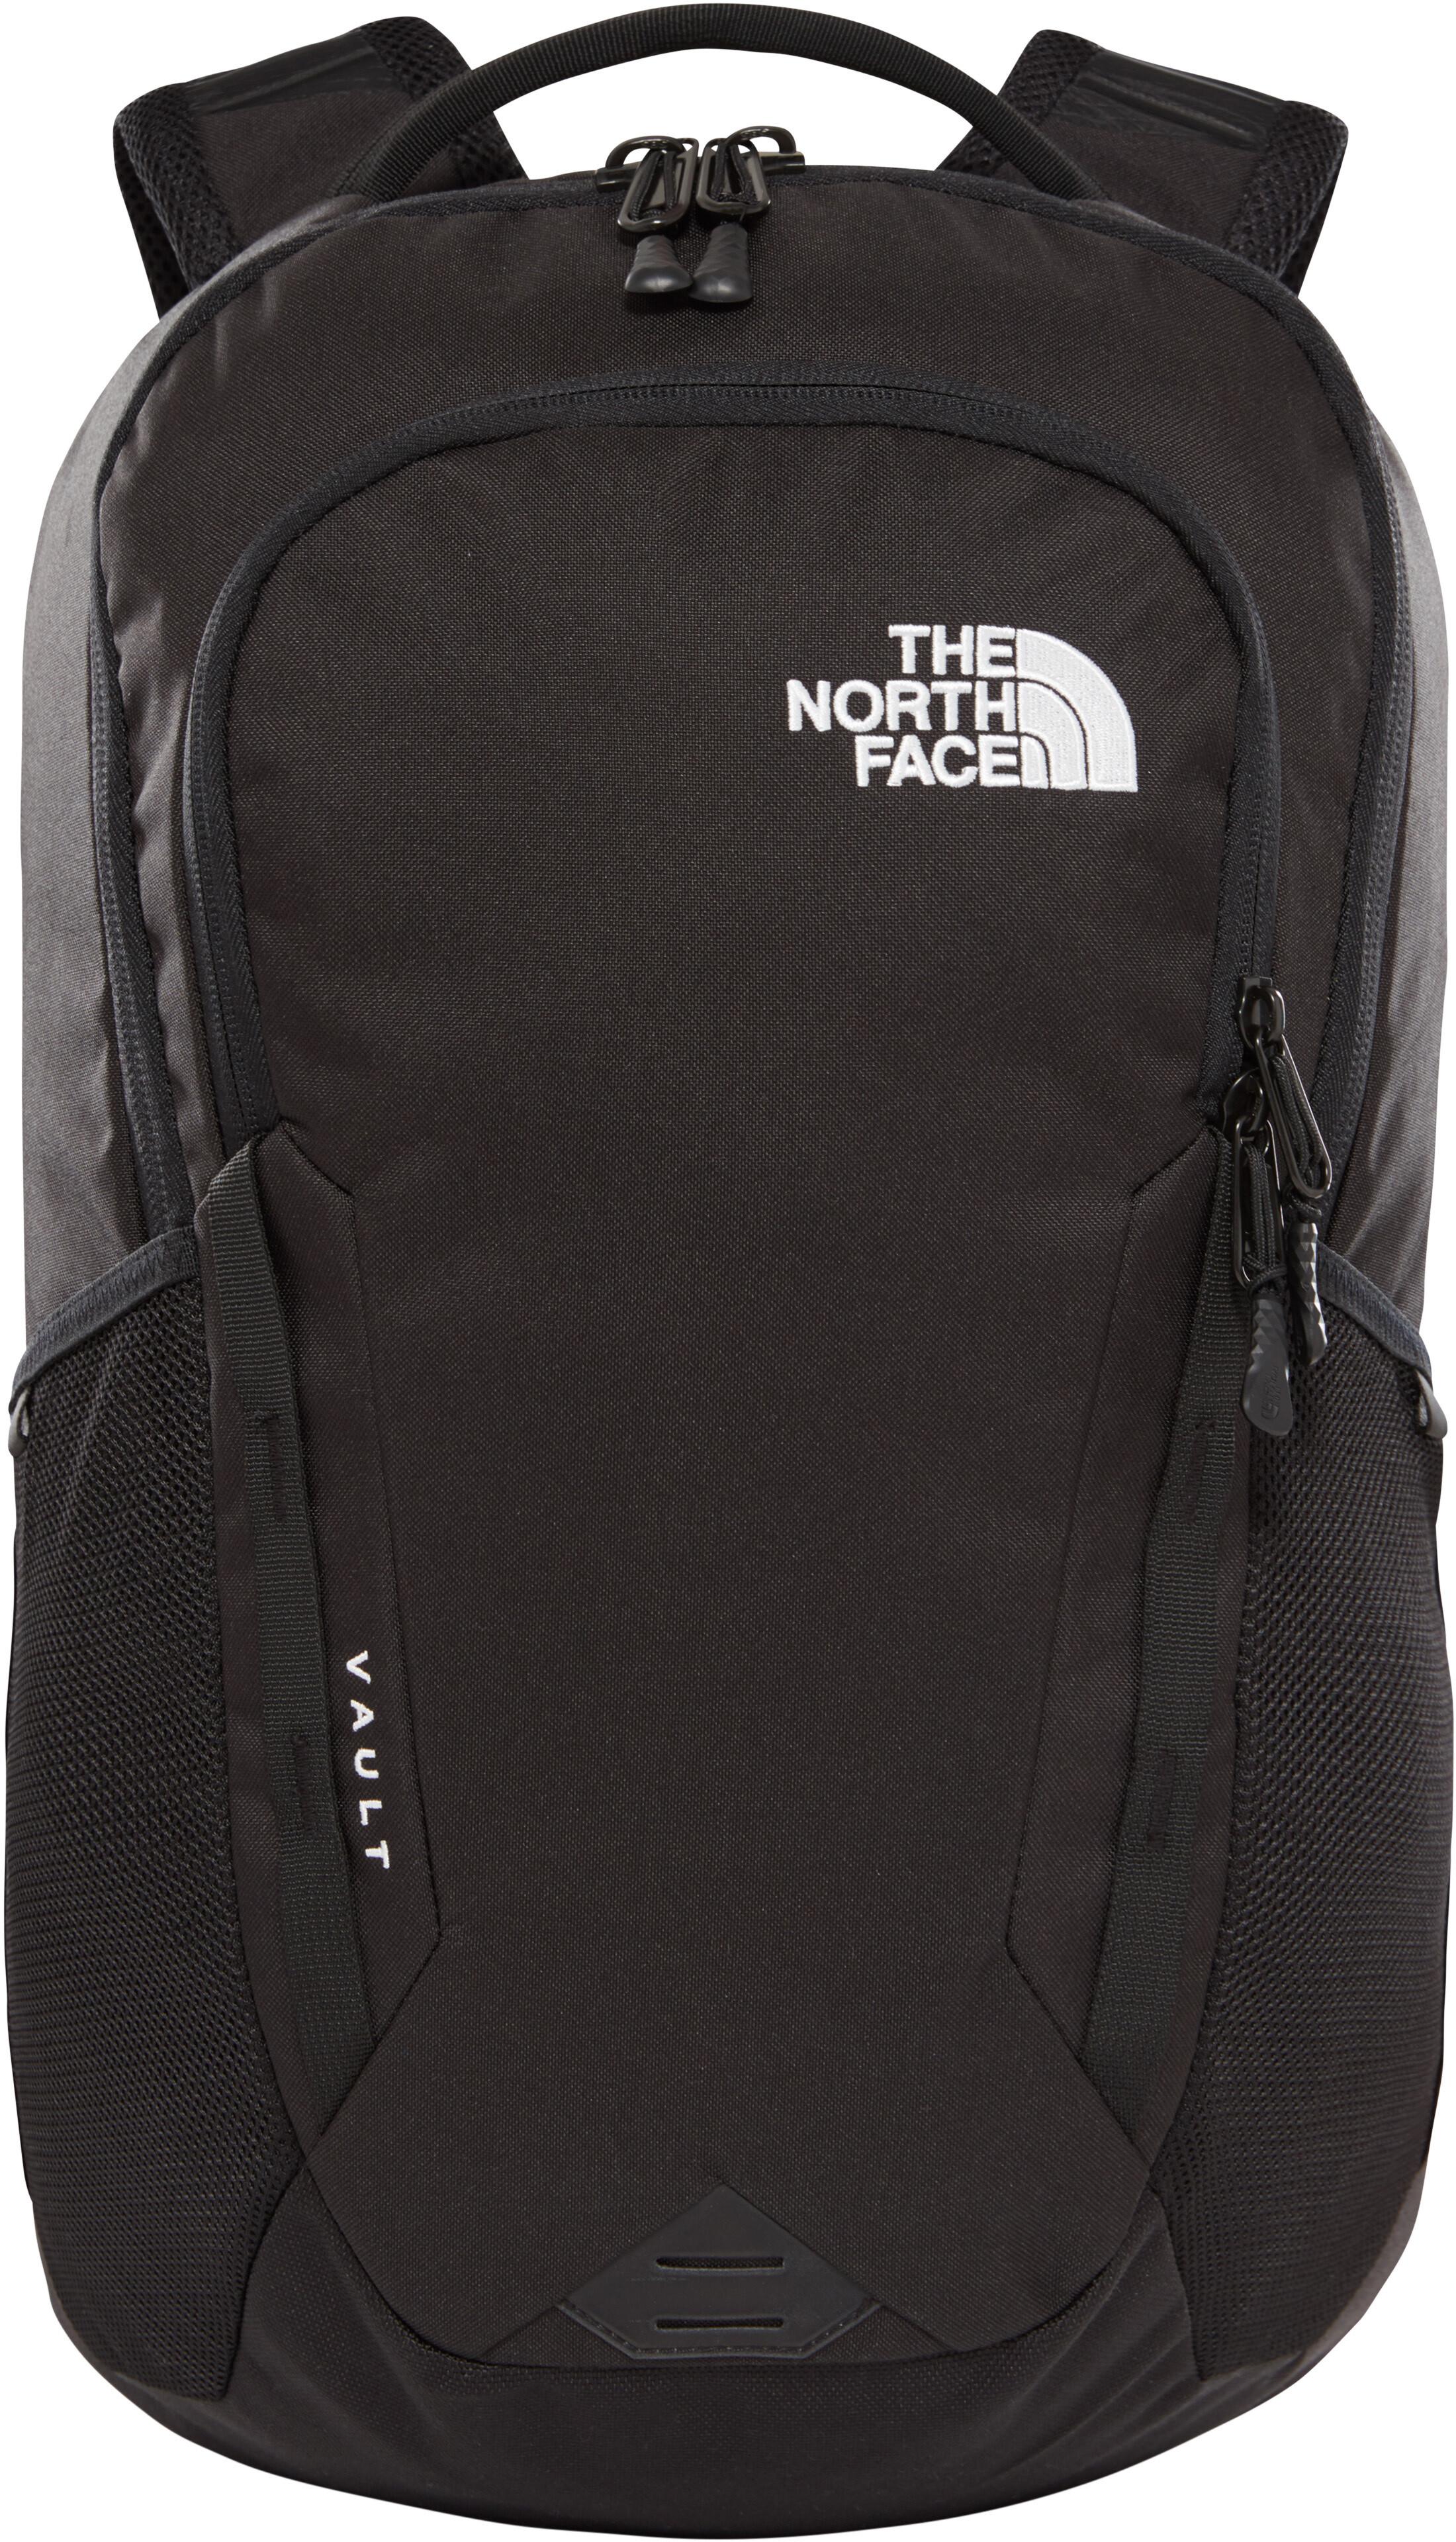 bca20cef15 The North Face Vault Sac à dos, tnf black - Boutique de vélos en ...